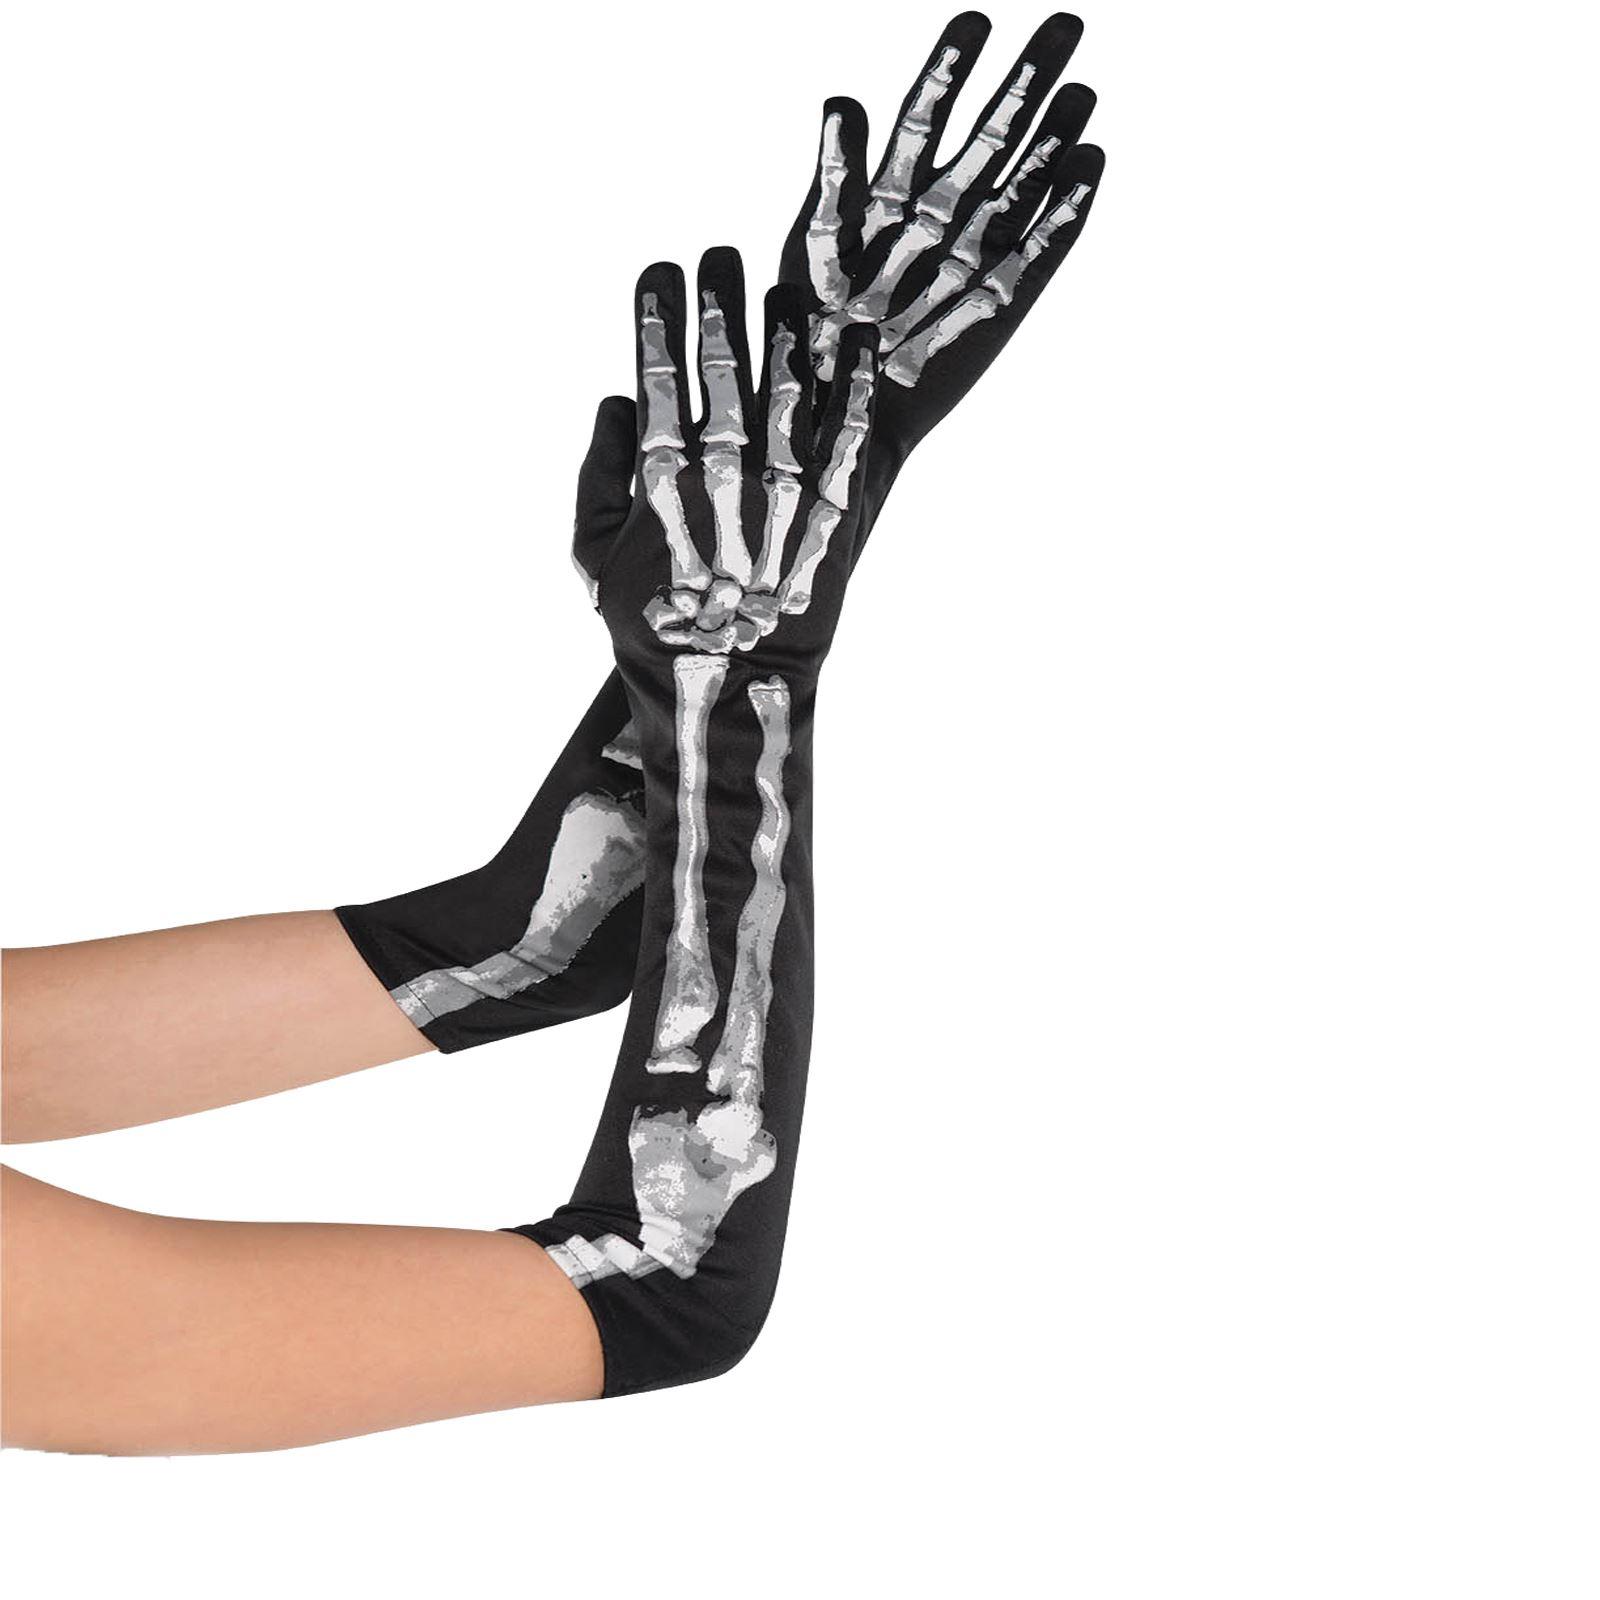 Skeleton Glove And Wrist Bone Gloves